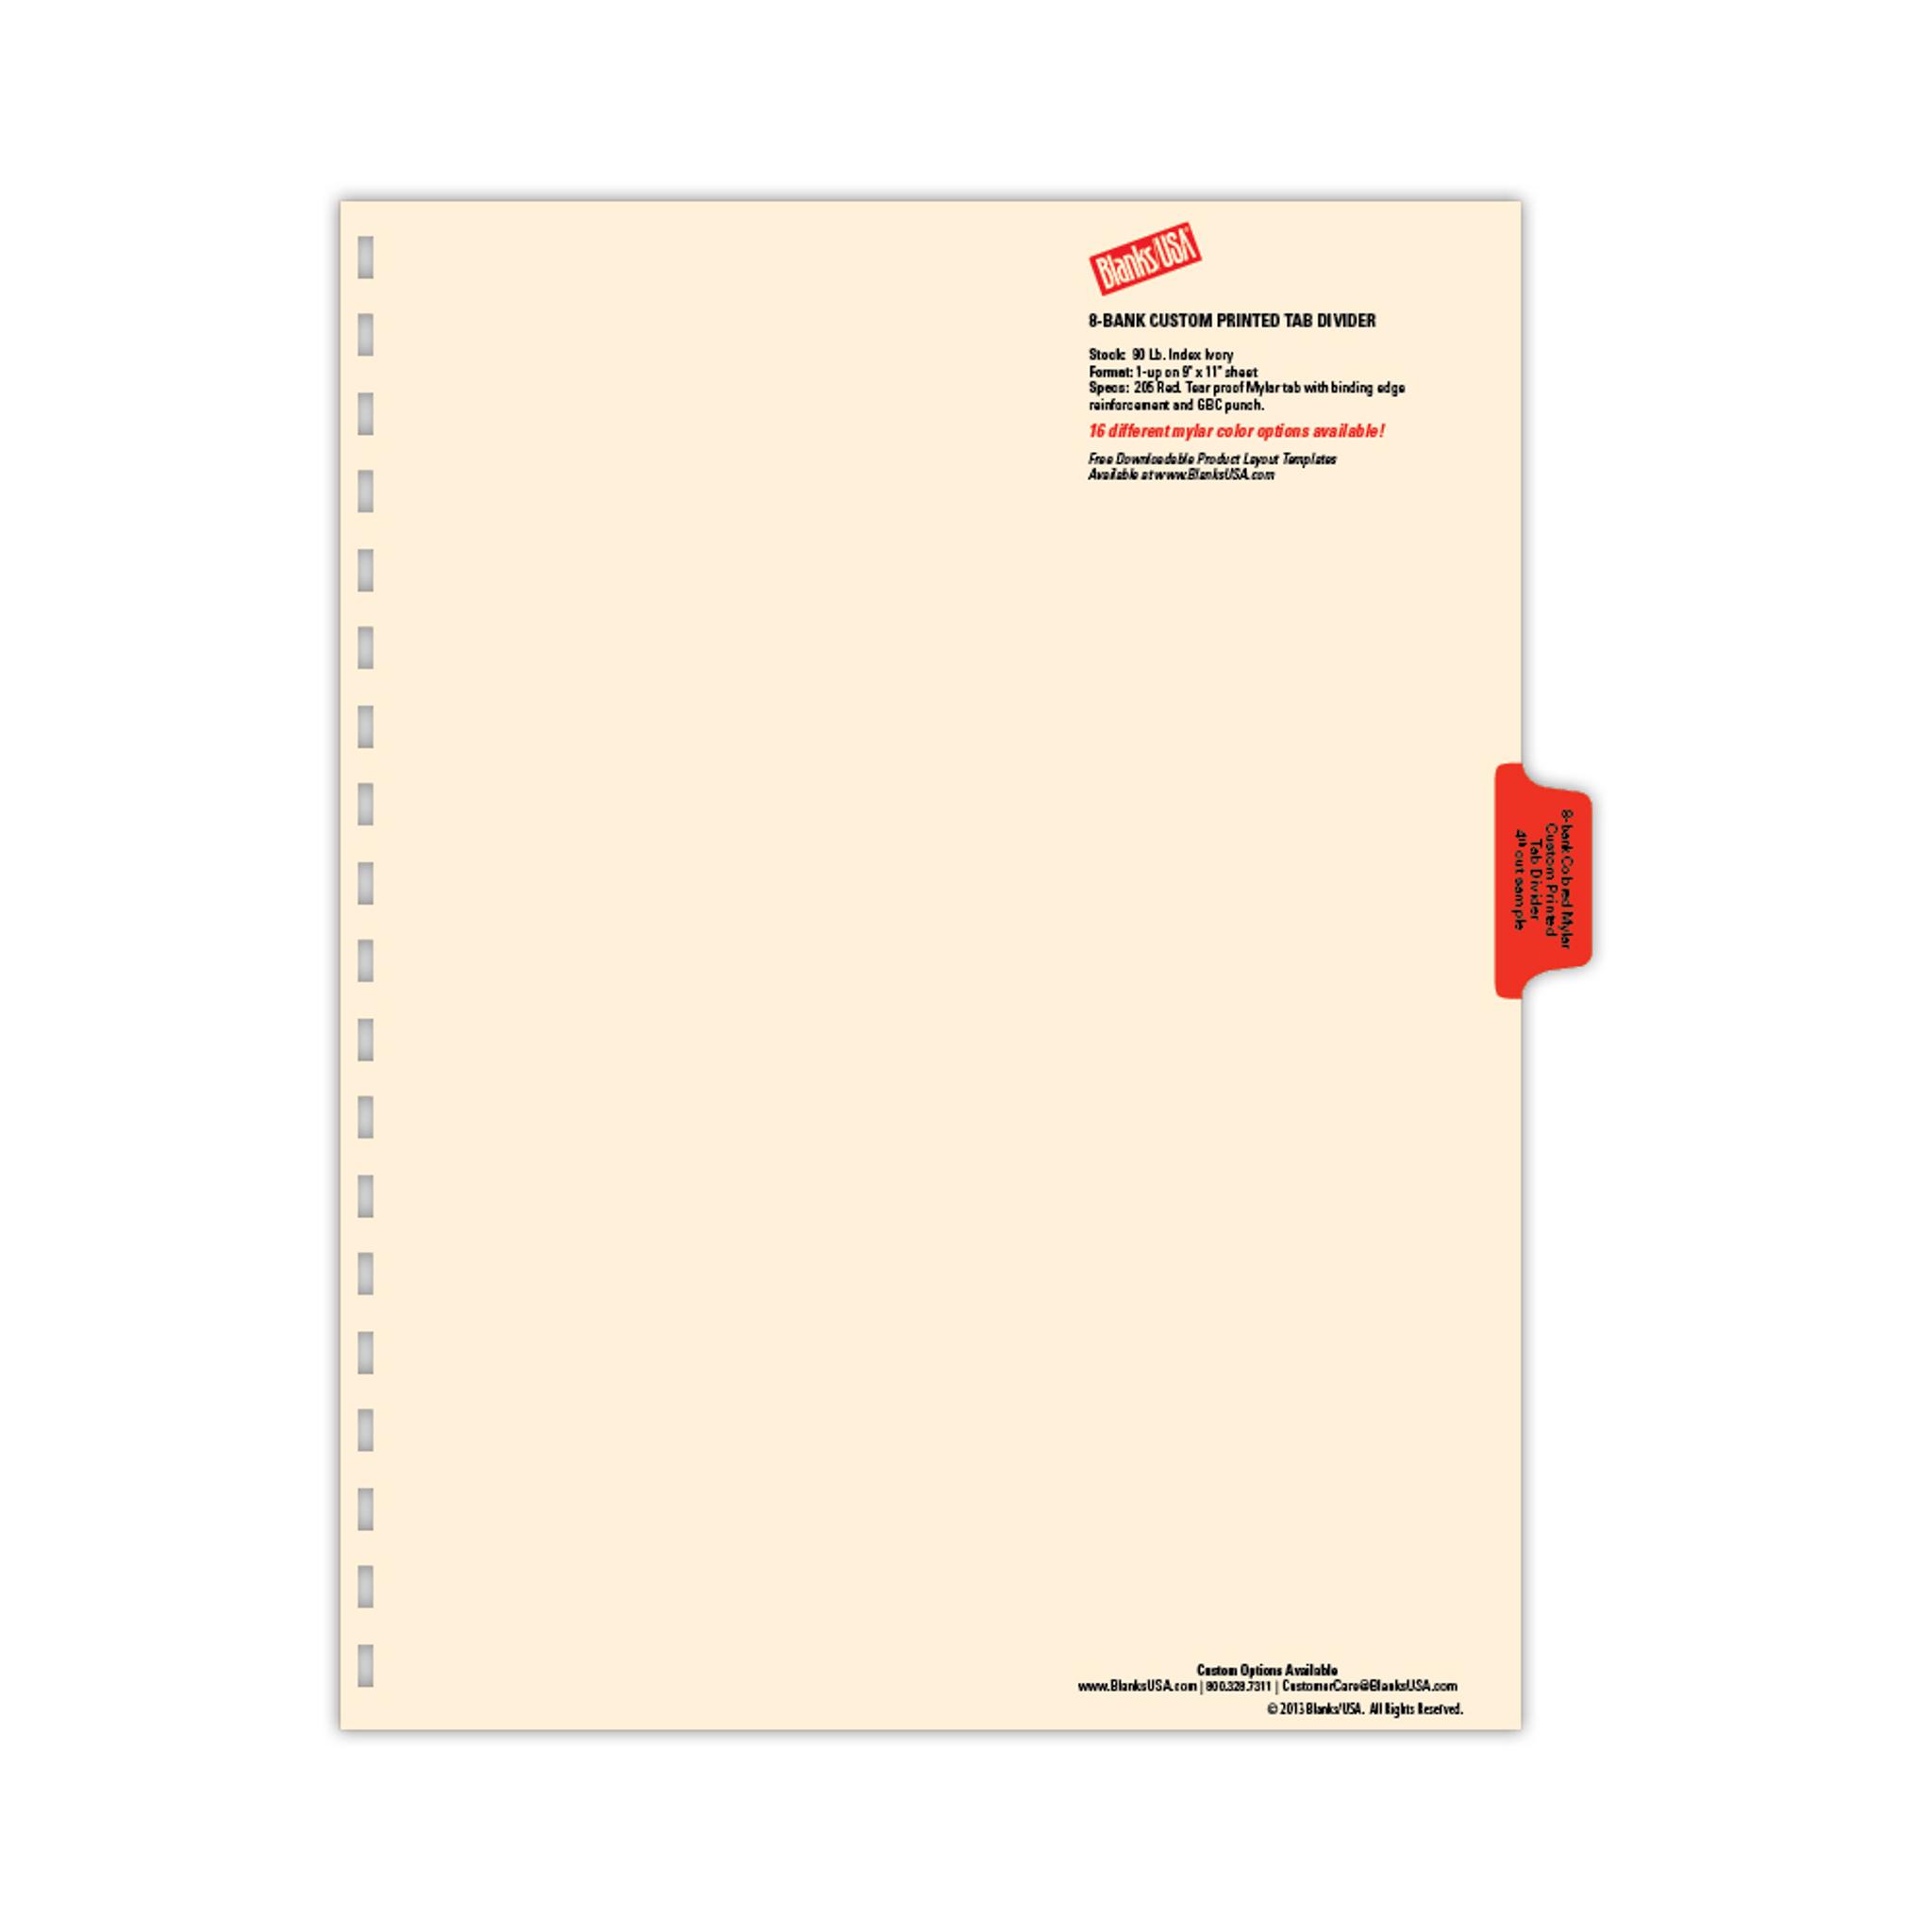 Copytab And Tab Divider Sample Bag Sampct Blanks Usa